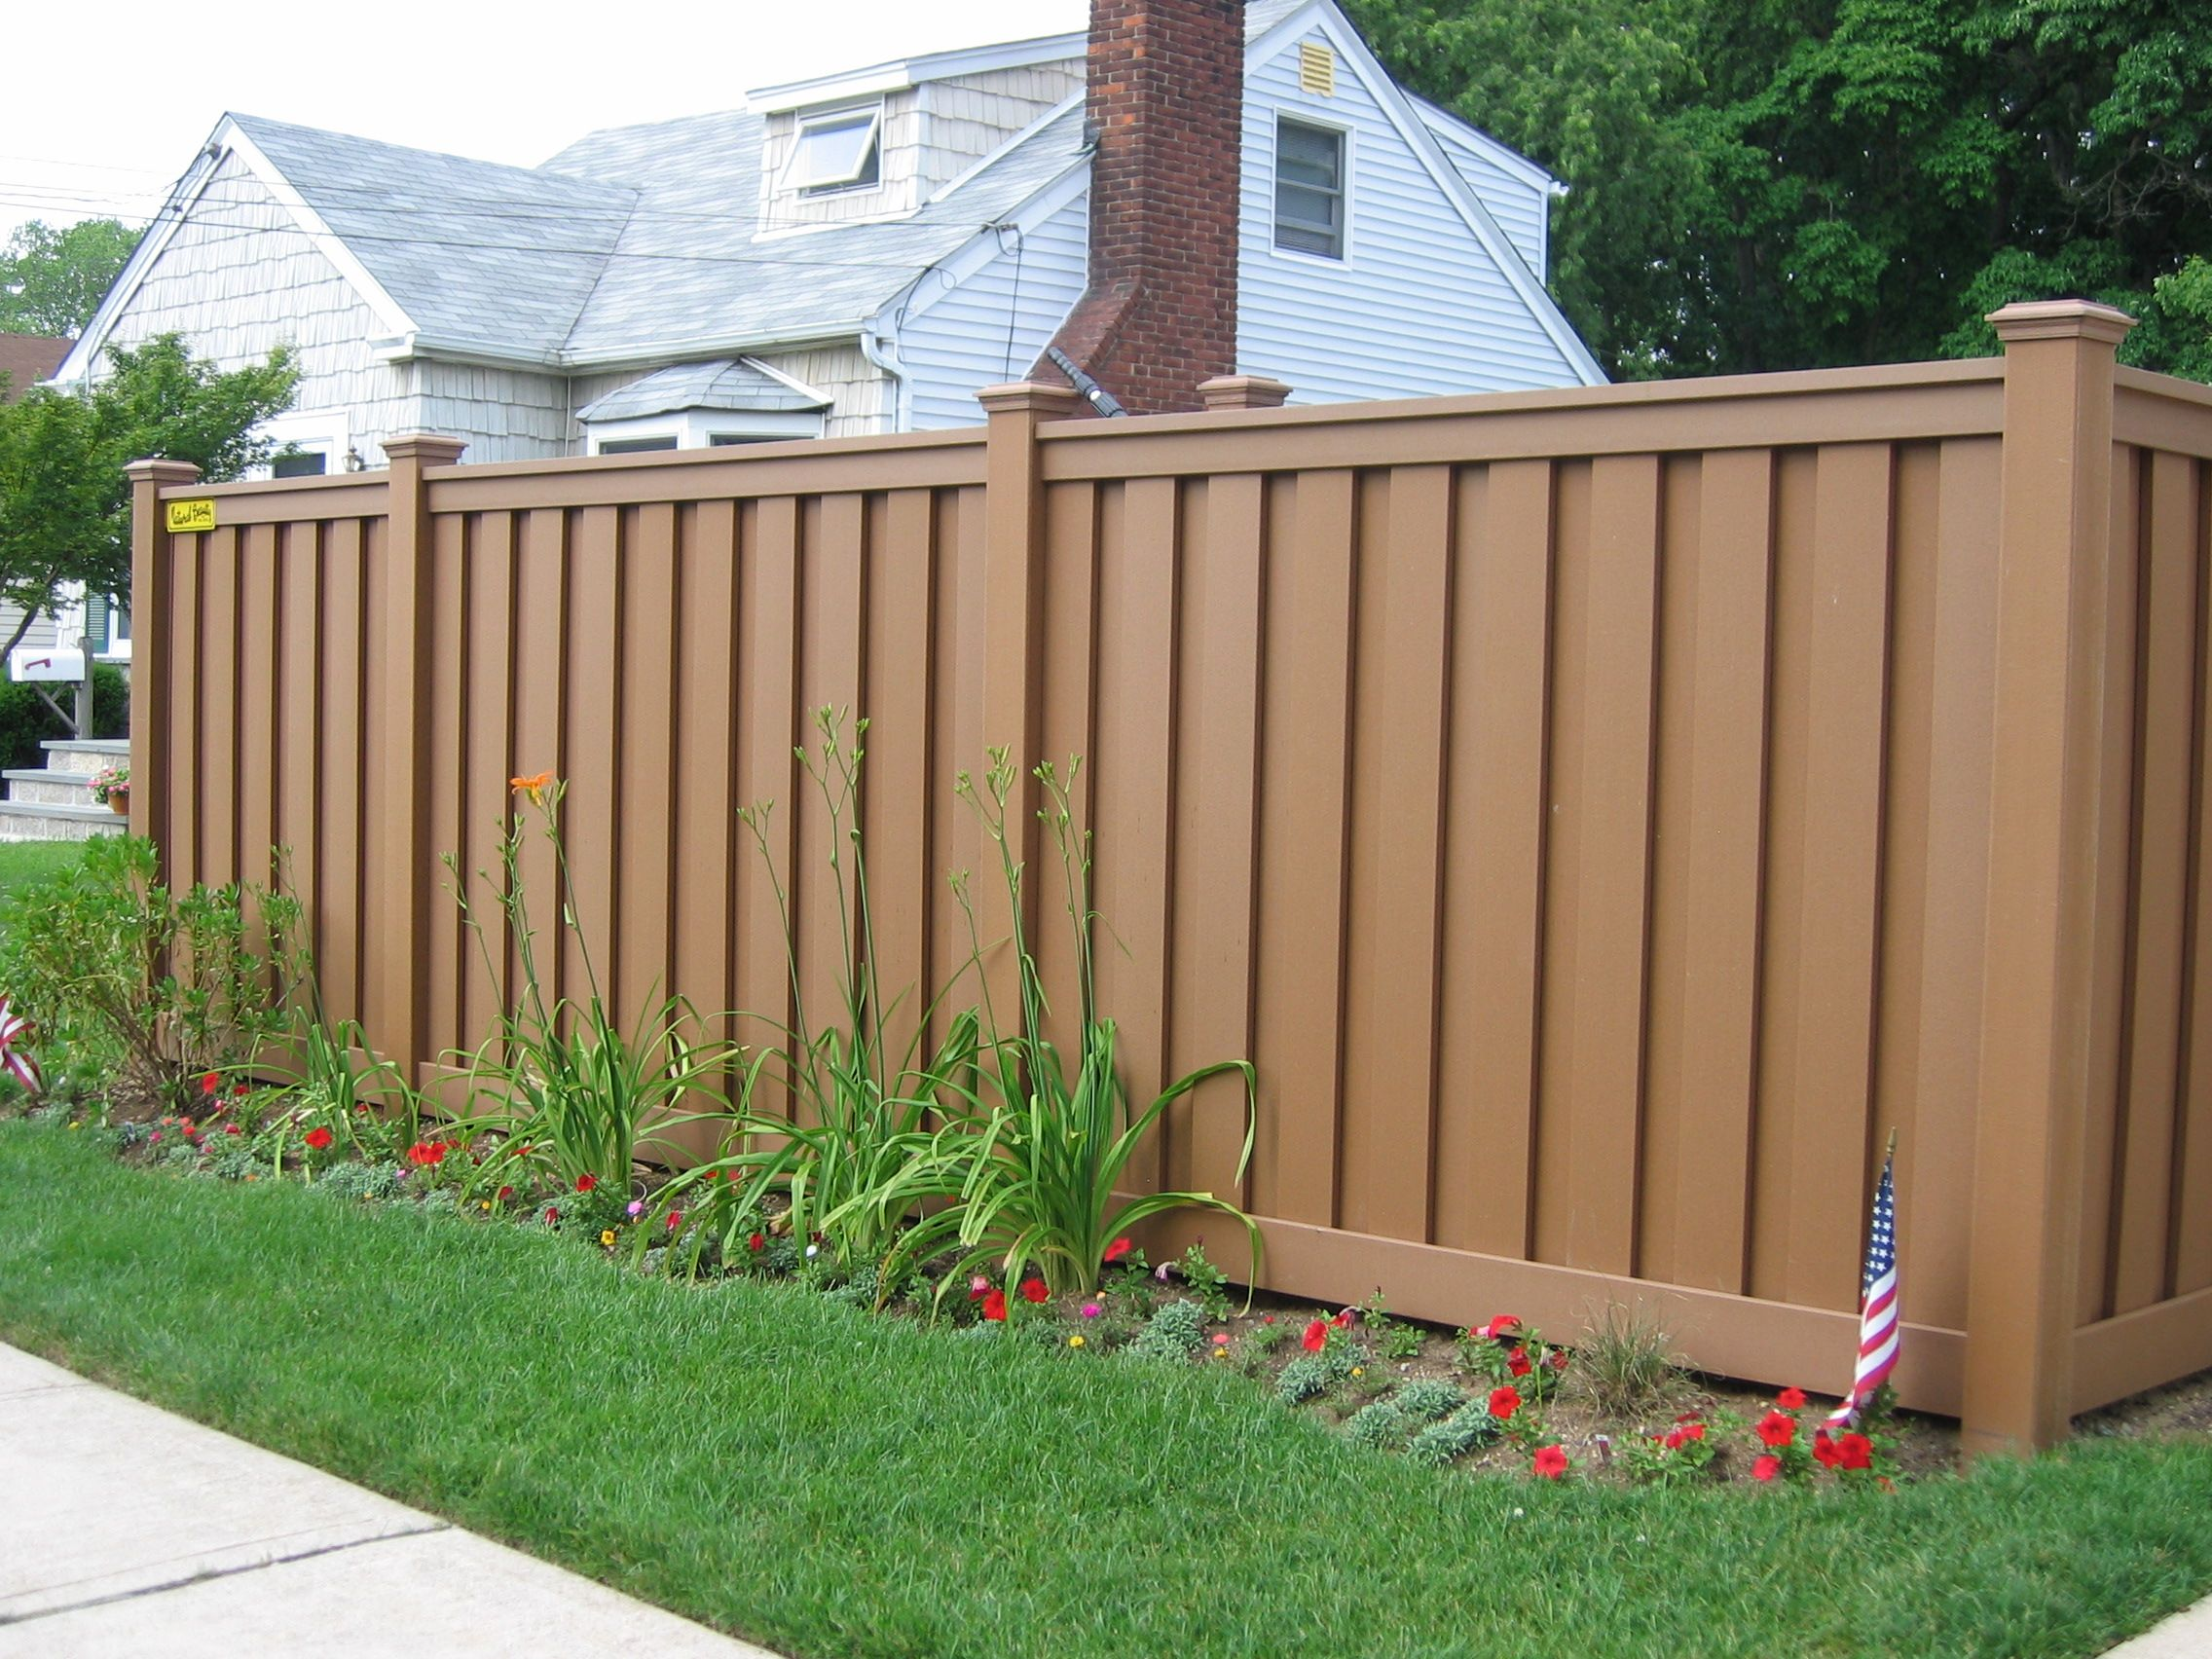 Anti uv outdoor wood plastic composite garden fence cheap pvc anti uv outdoor wood plastic composite garden fence baanklon Choice Image